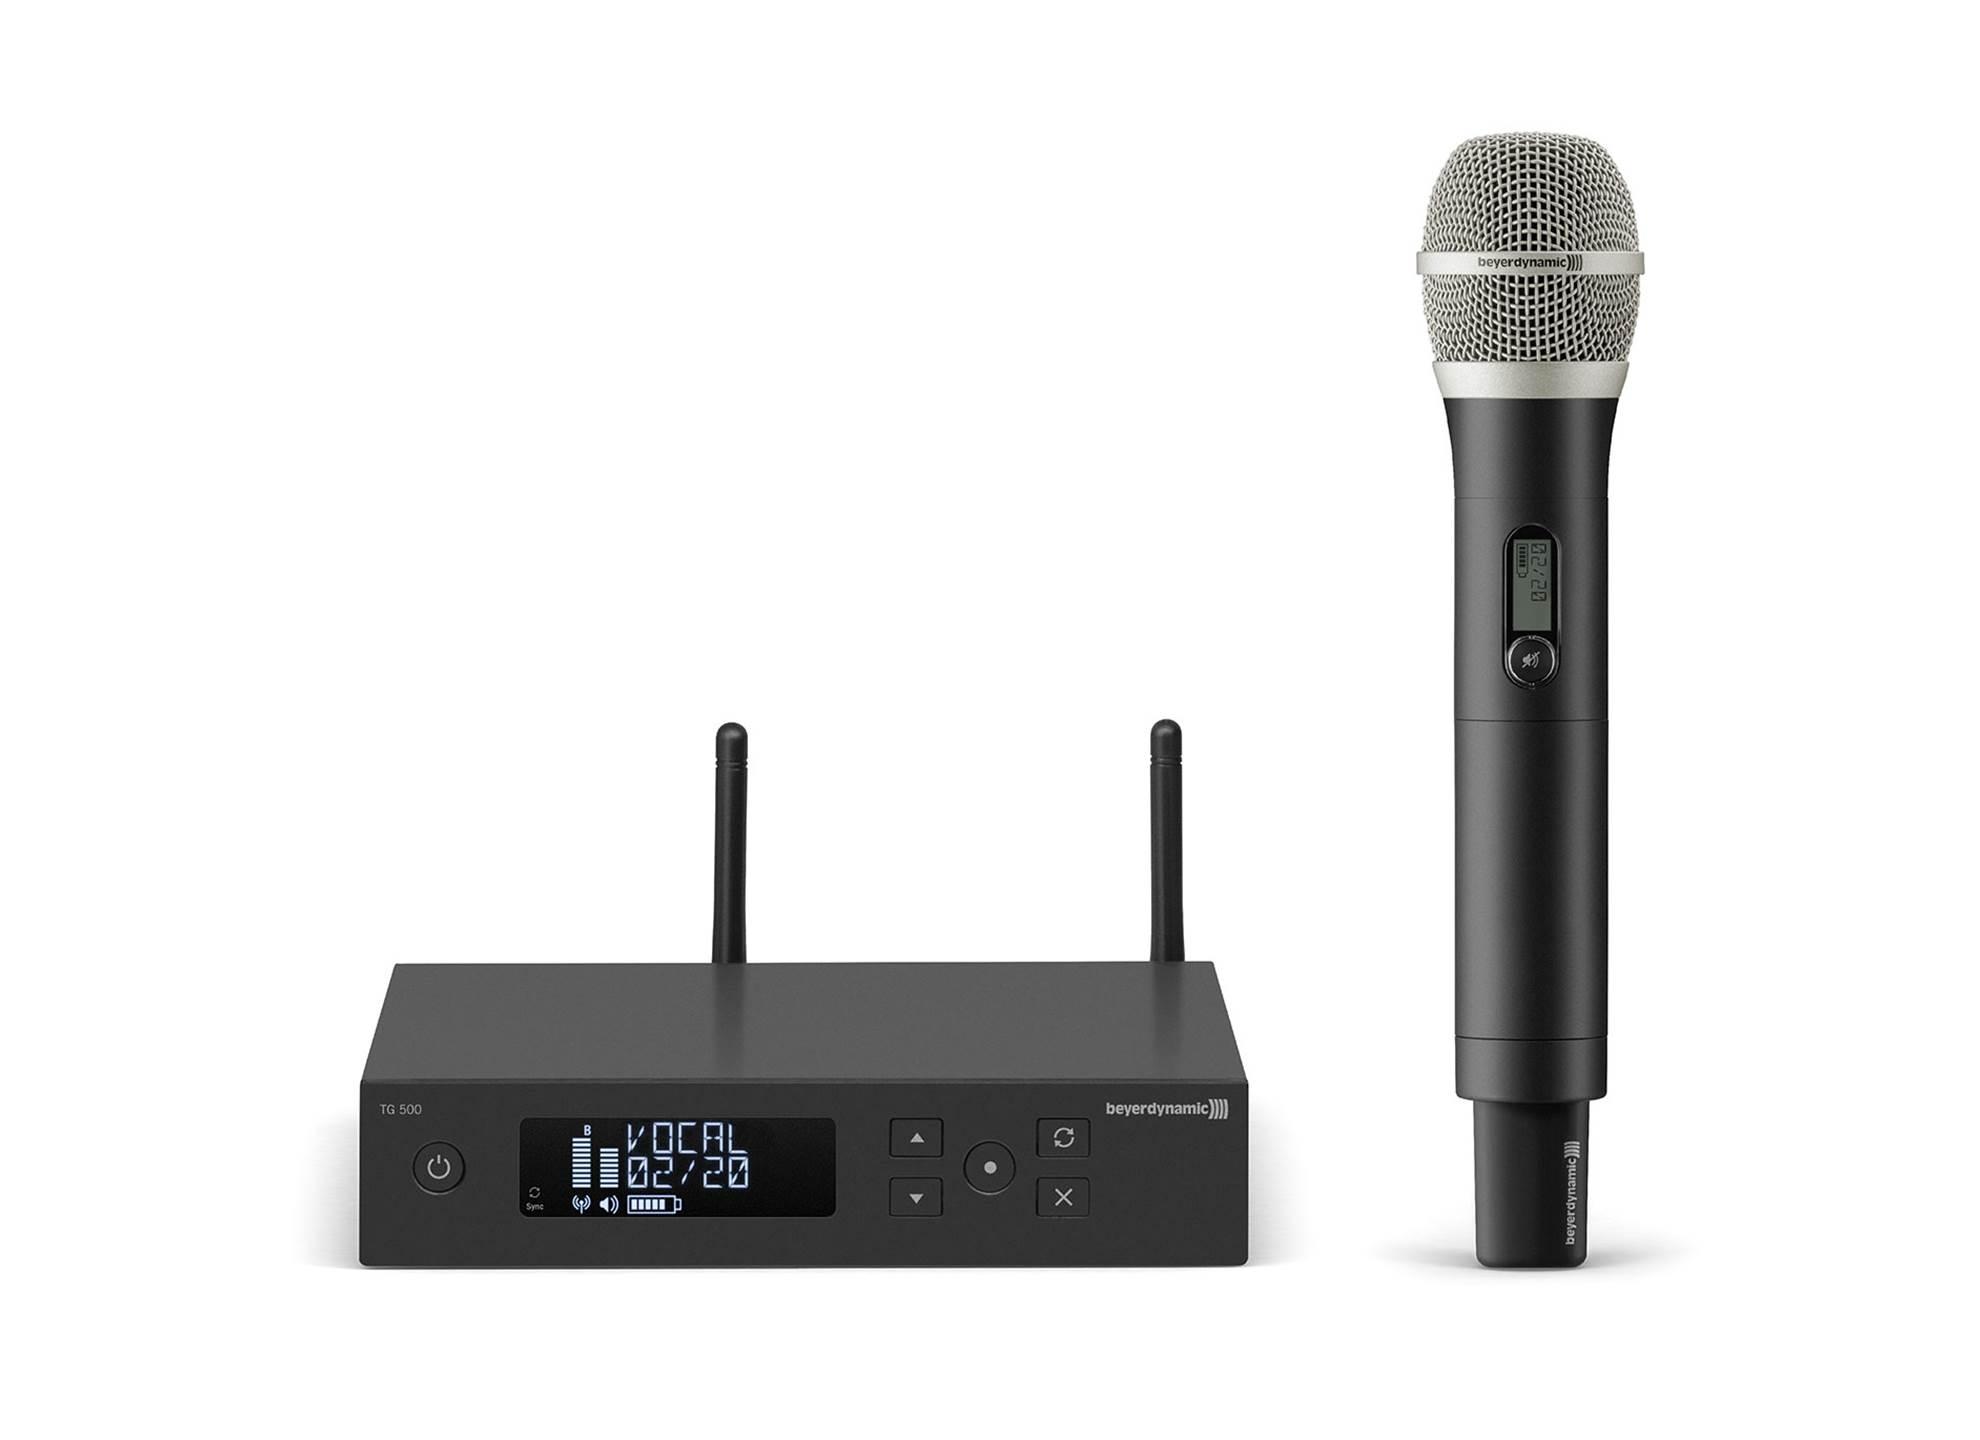 TG 550 Vocal Set 606-636 MHz